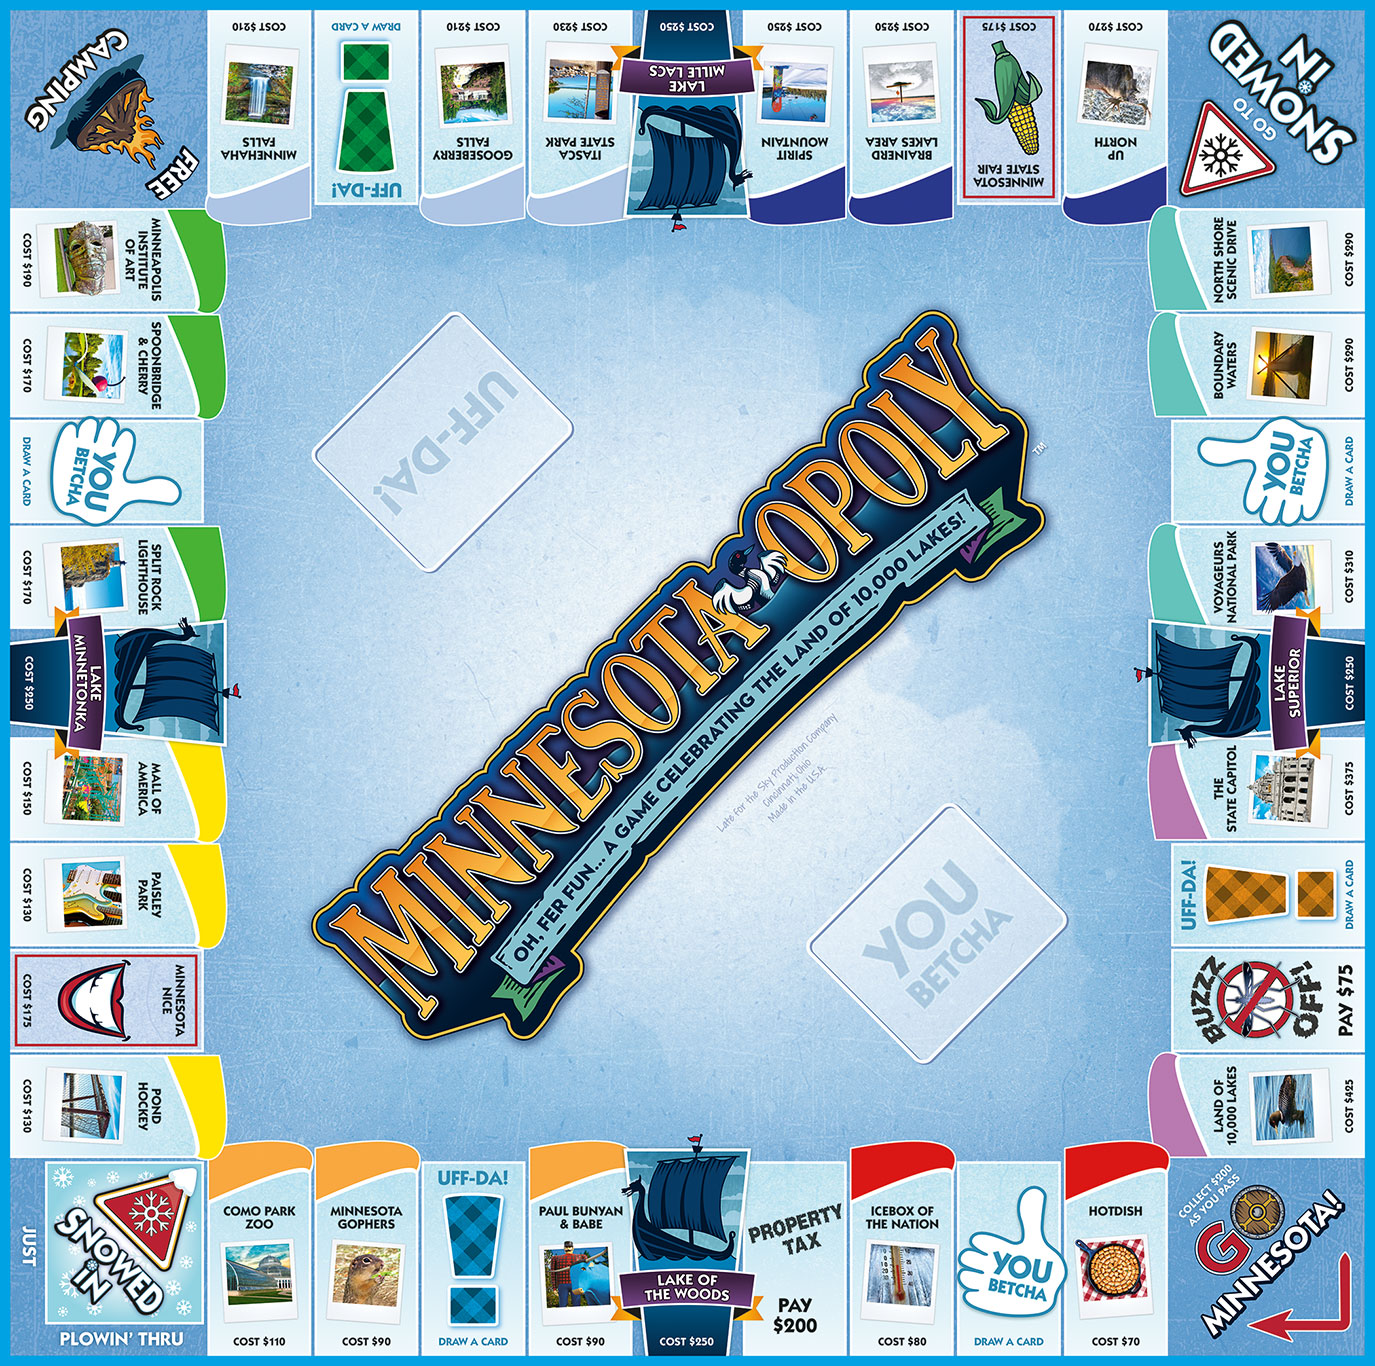 MINNESOTA-OPOLY Board Game